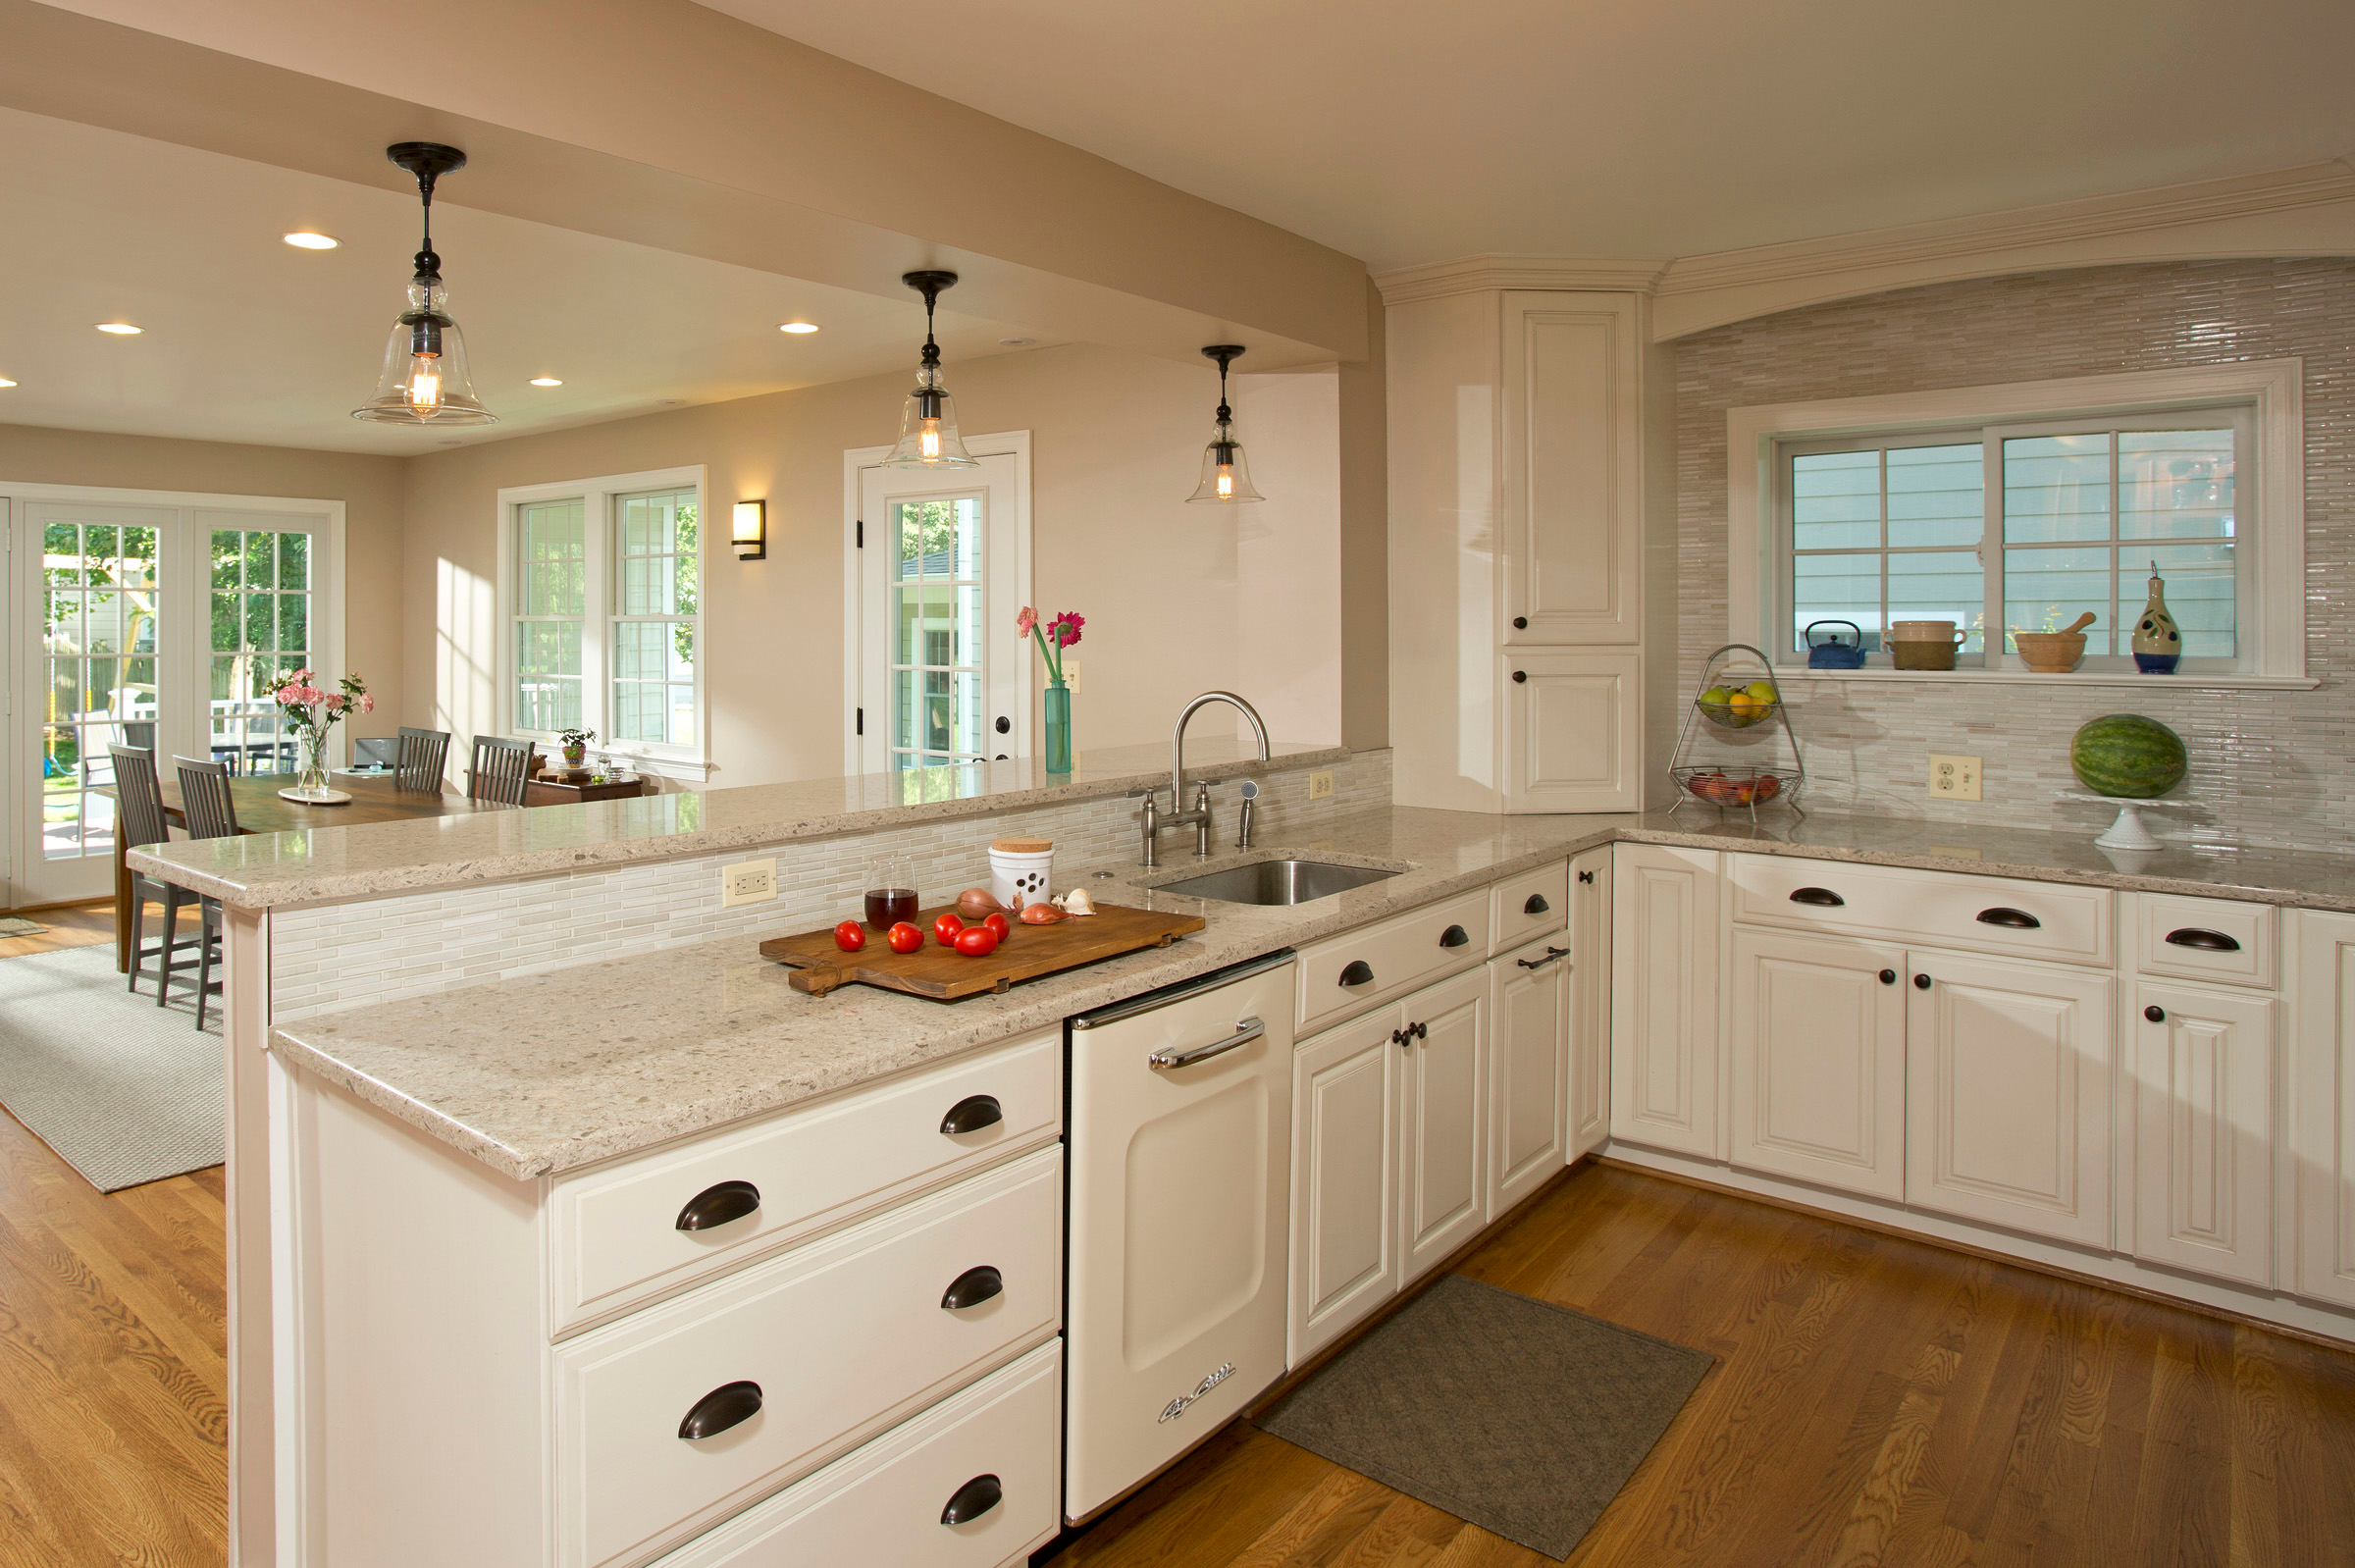 Merrill contracting remodeling inc in arlington va for Kitchen remodeling arlington va